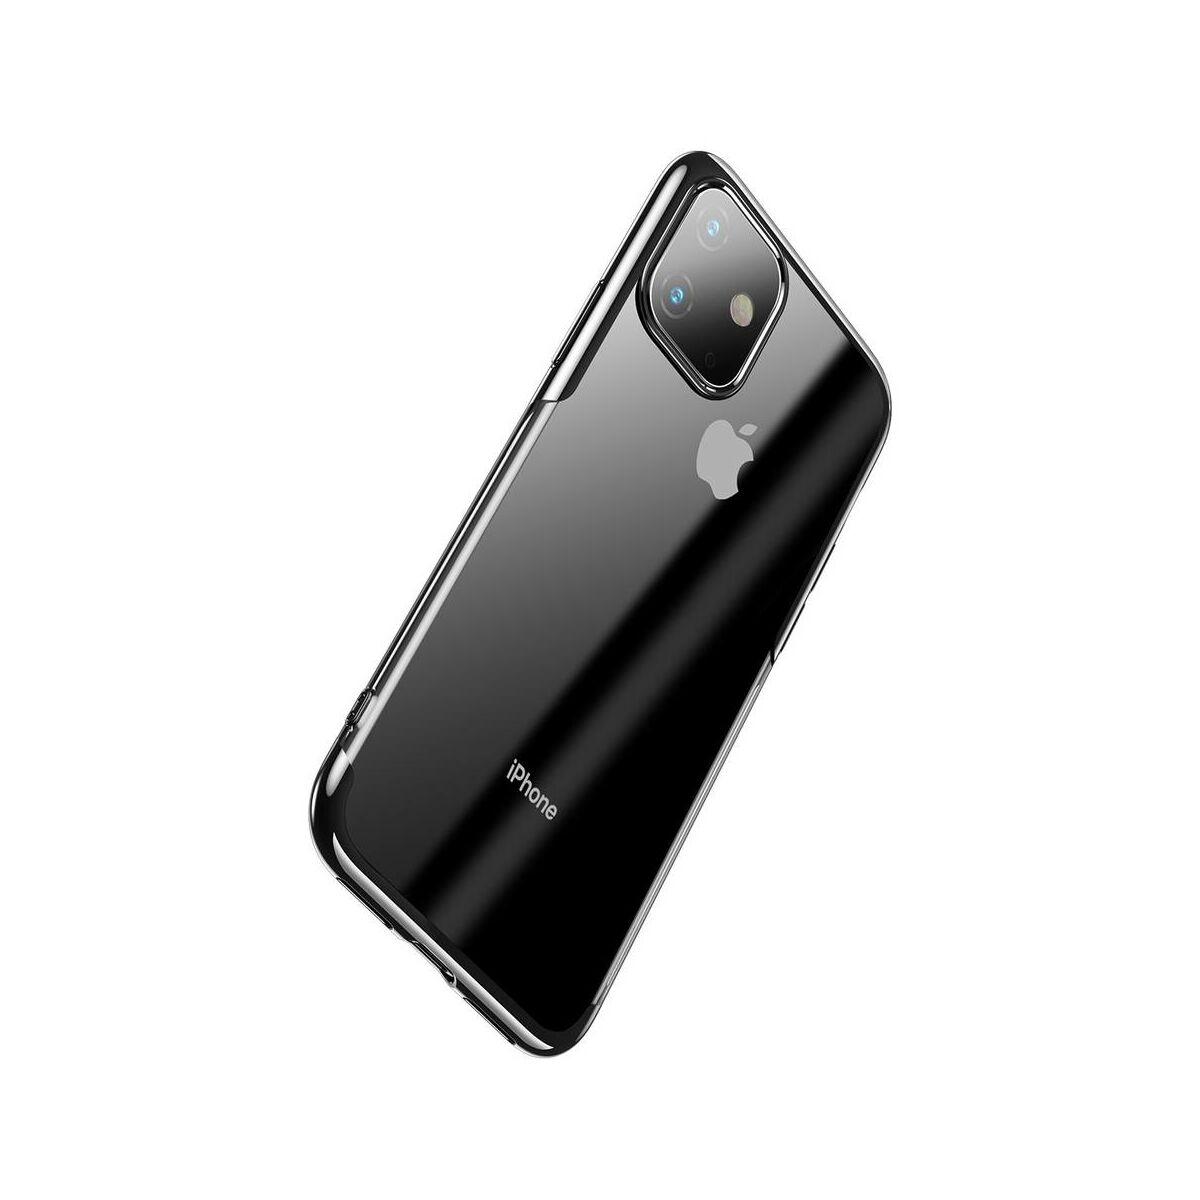 Baseus iPhone 11 tok, Shining, fekete (ARAPIPH61S-MD01)